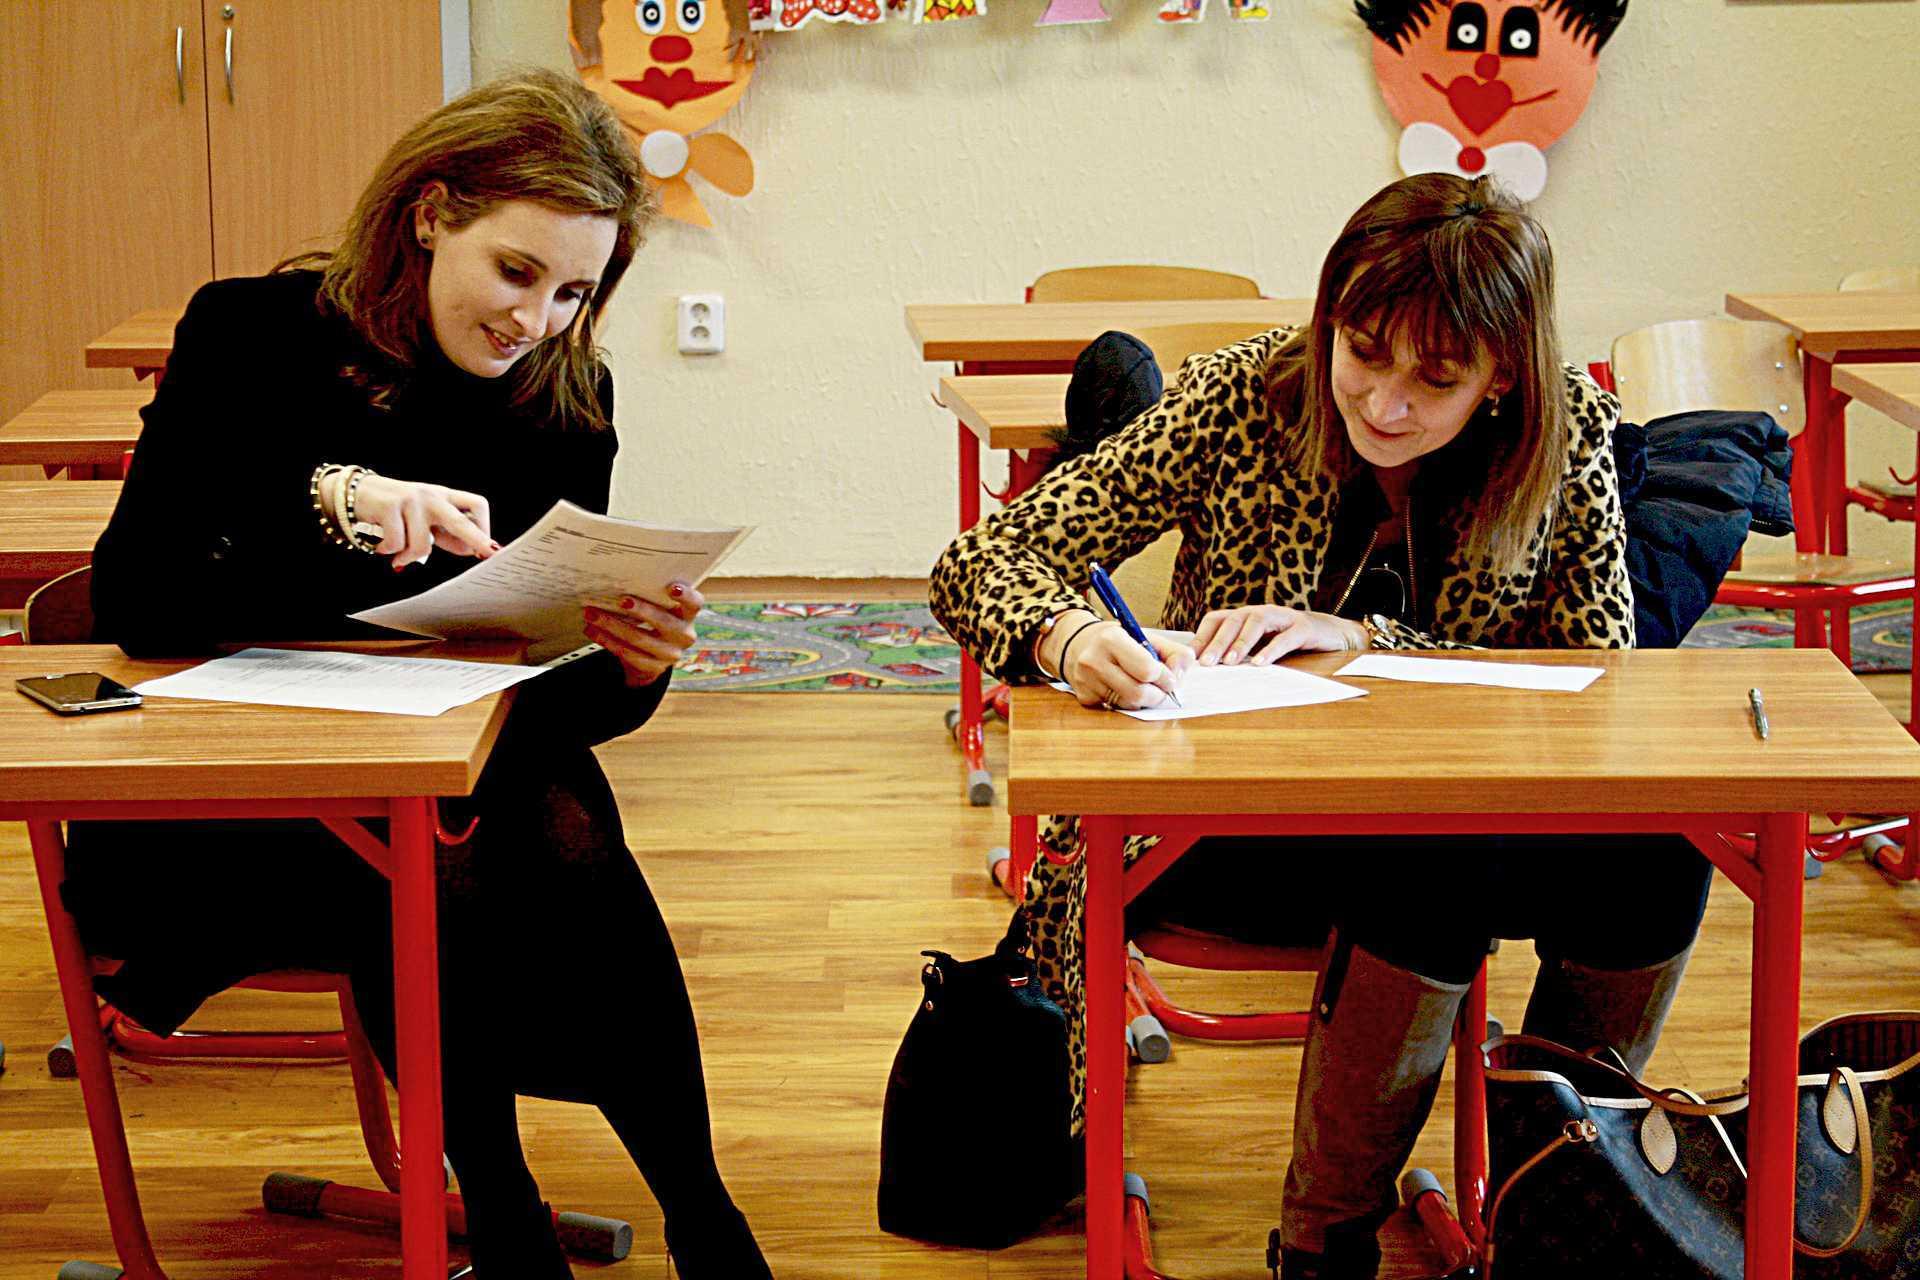 5 easiest ways to learn Spanish language